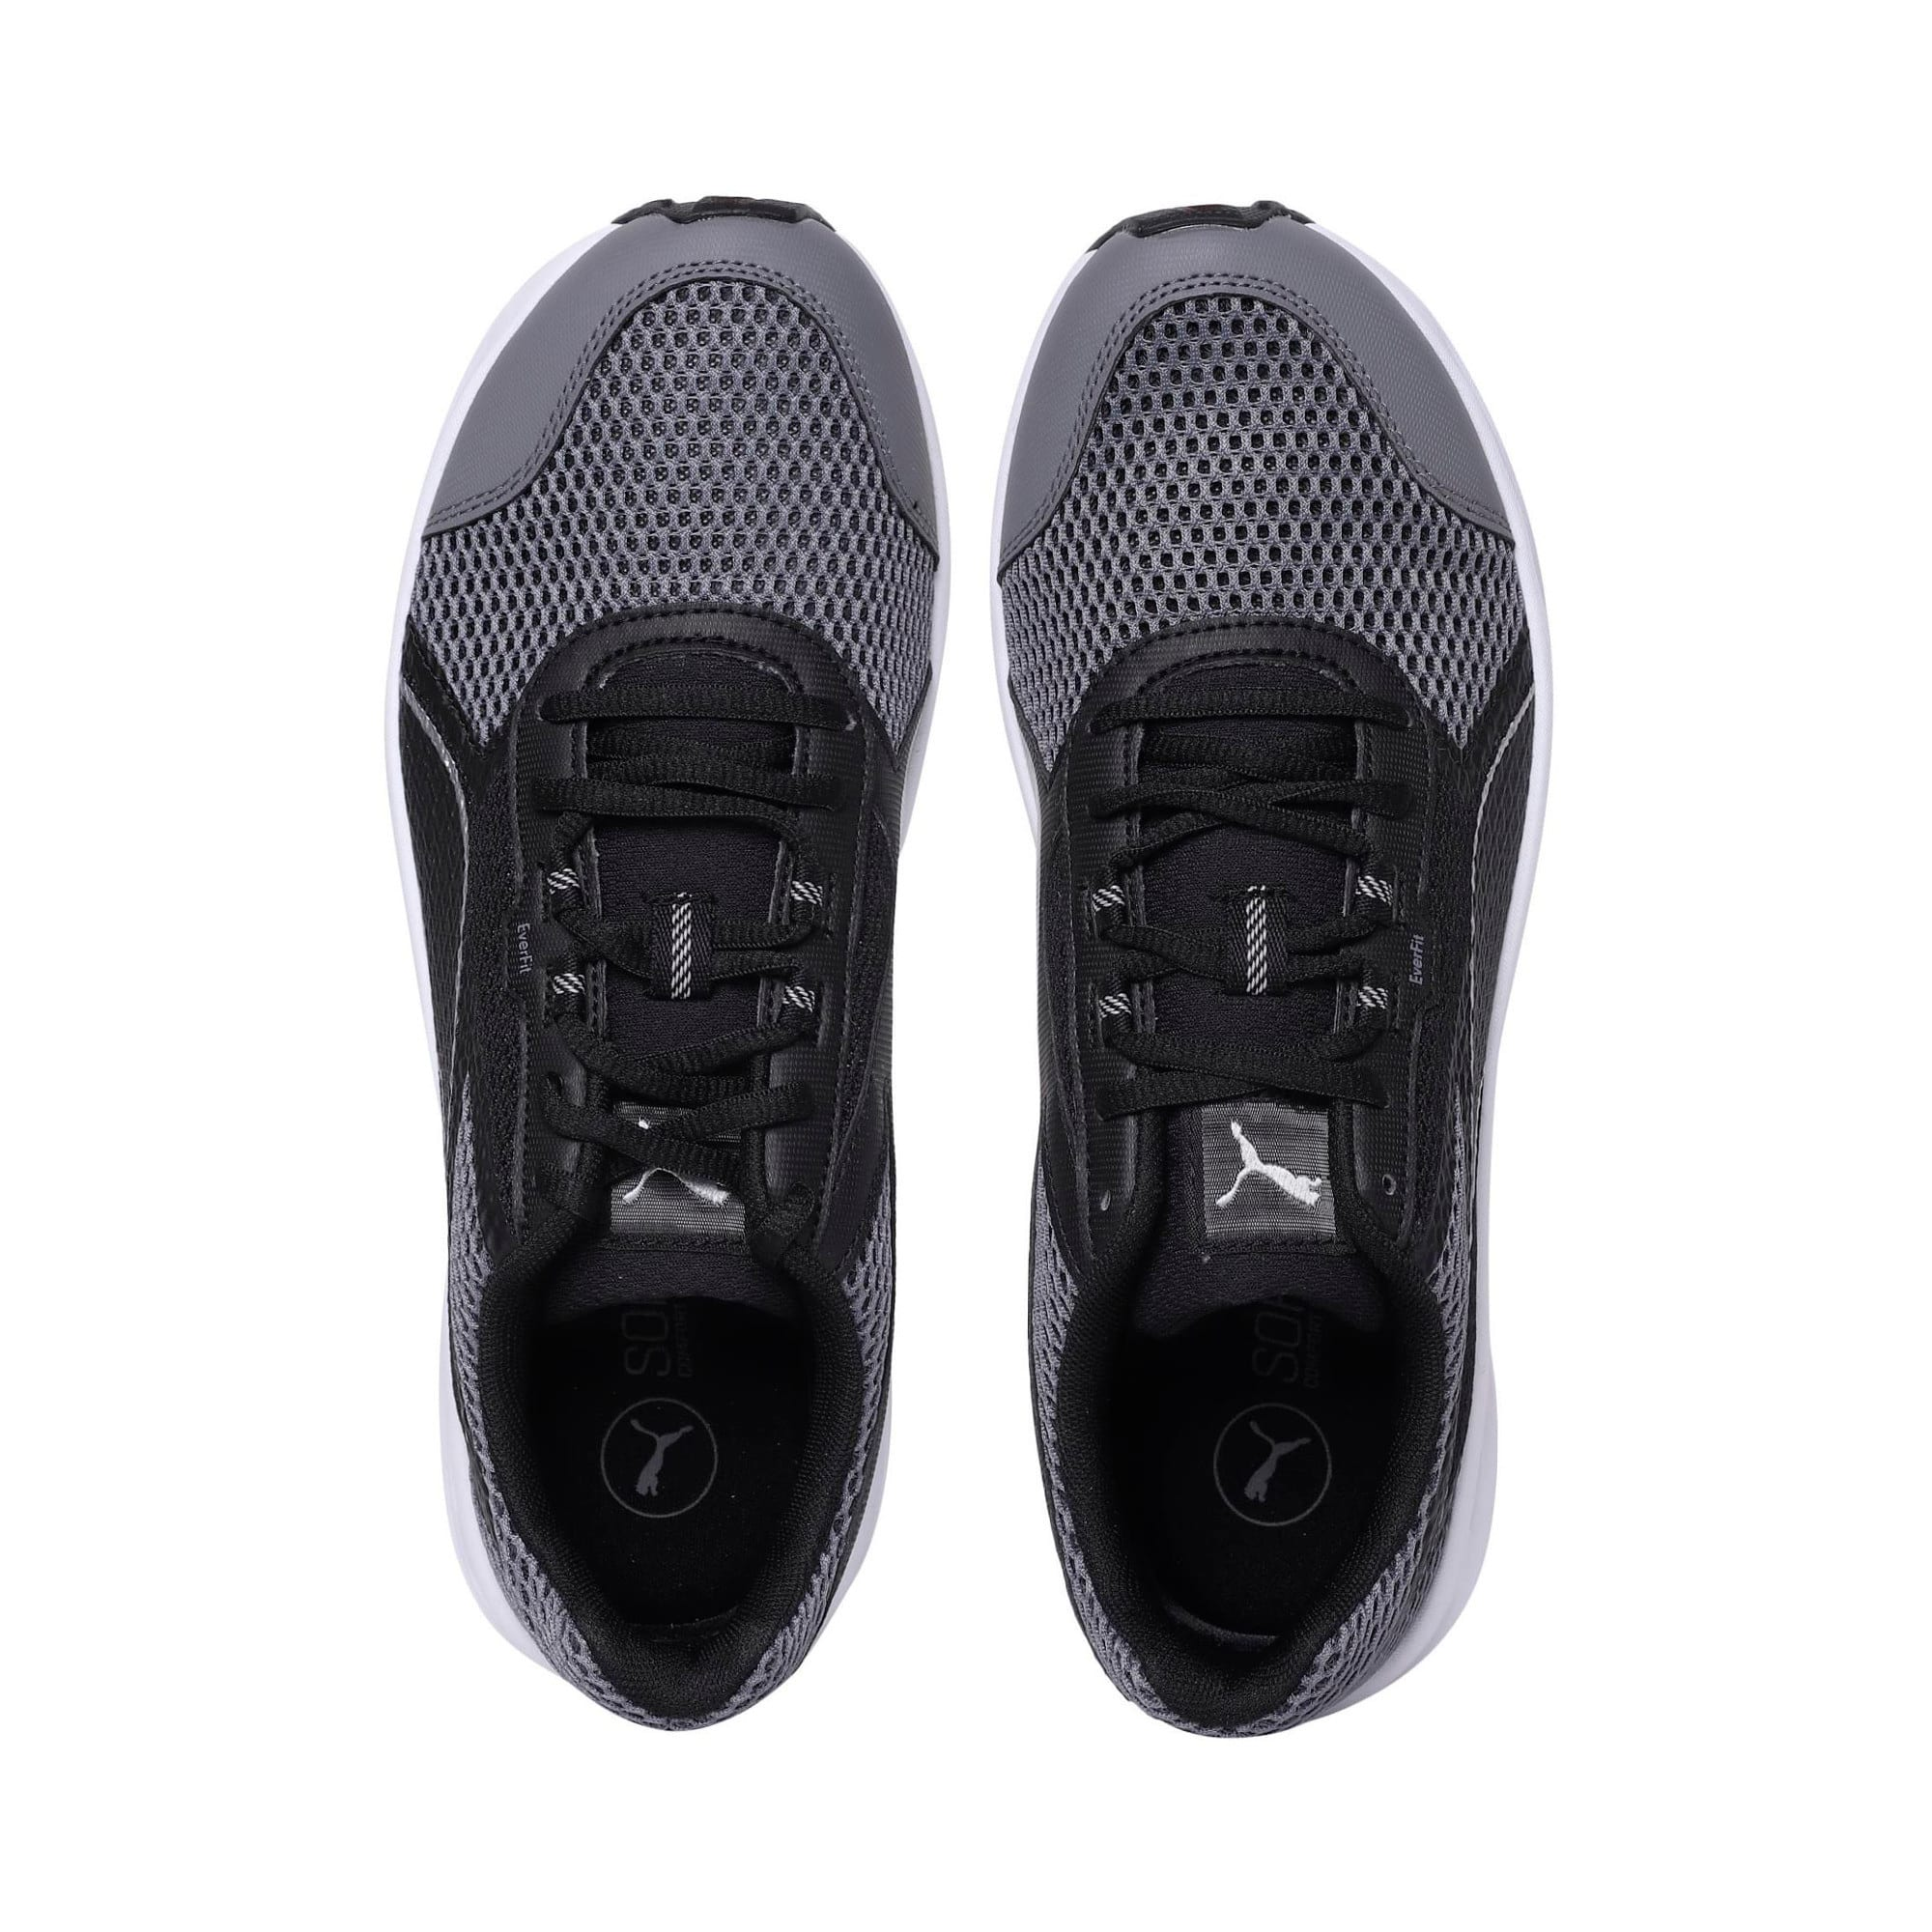 Thumbnail 6 of Essential Runner Men's Running Shoes, QUIET SHADE-Black-Silver, medium-IND